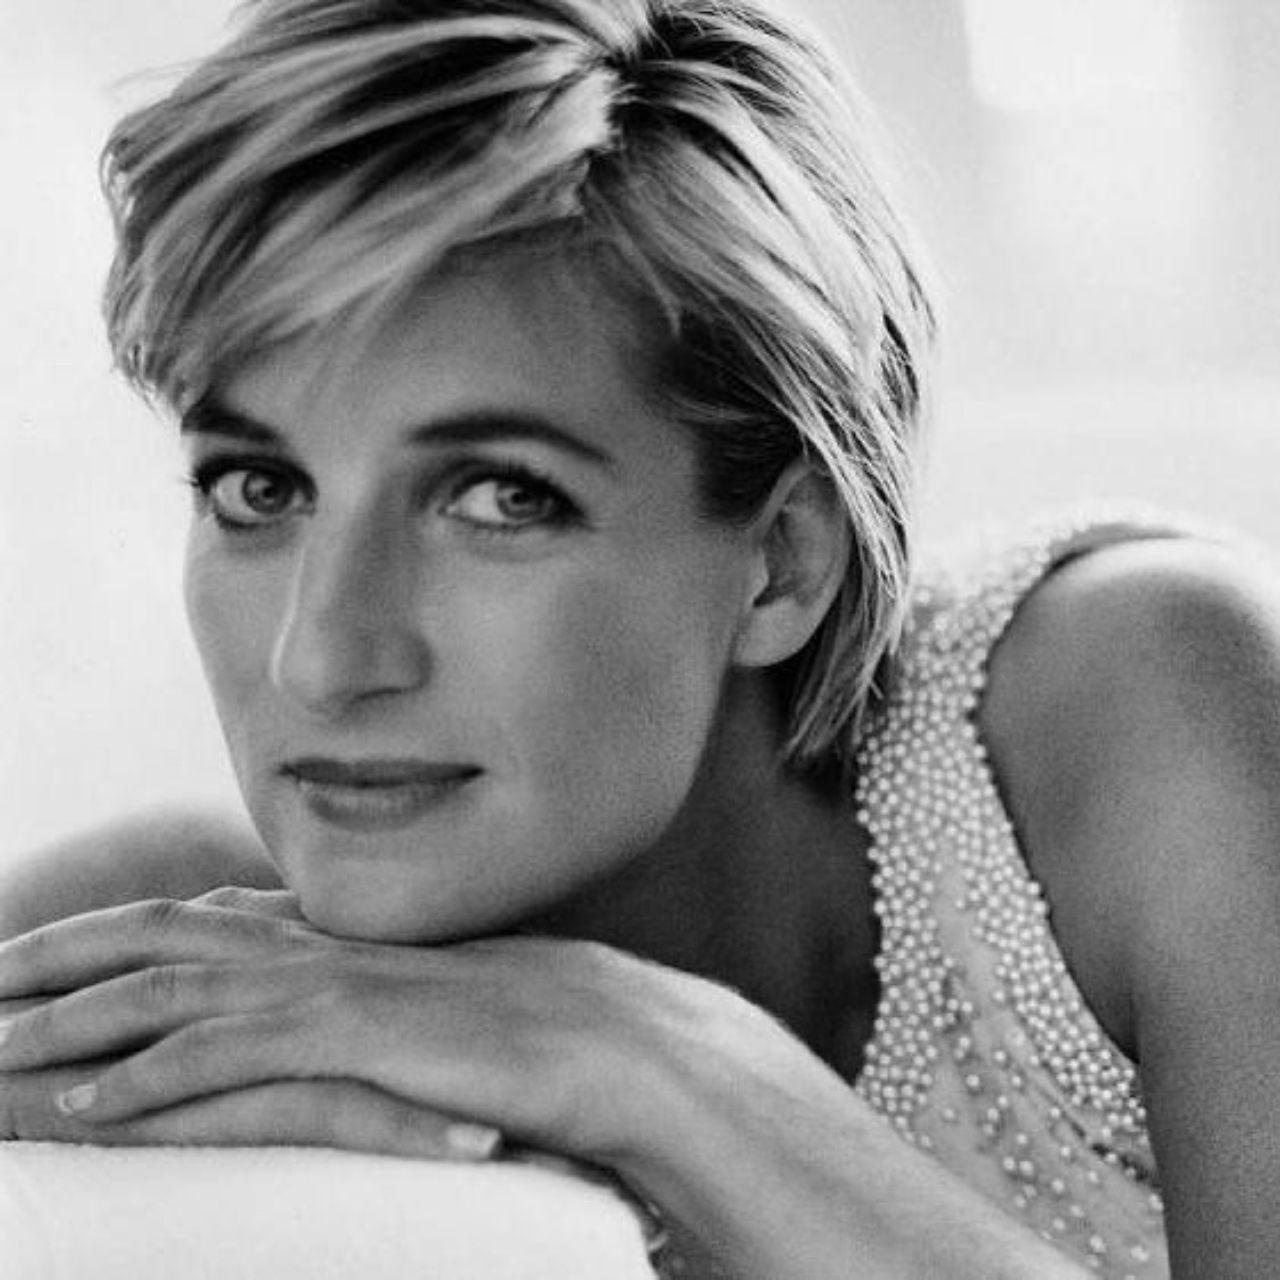 Belleza de princesa Diana rostro